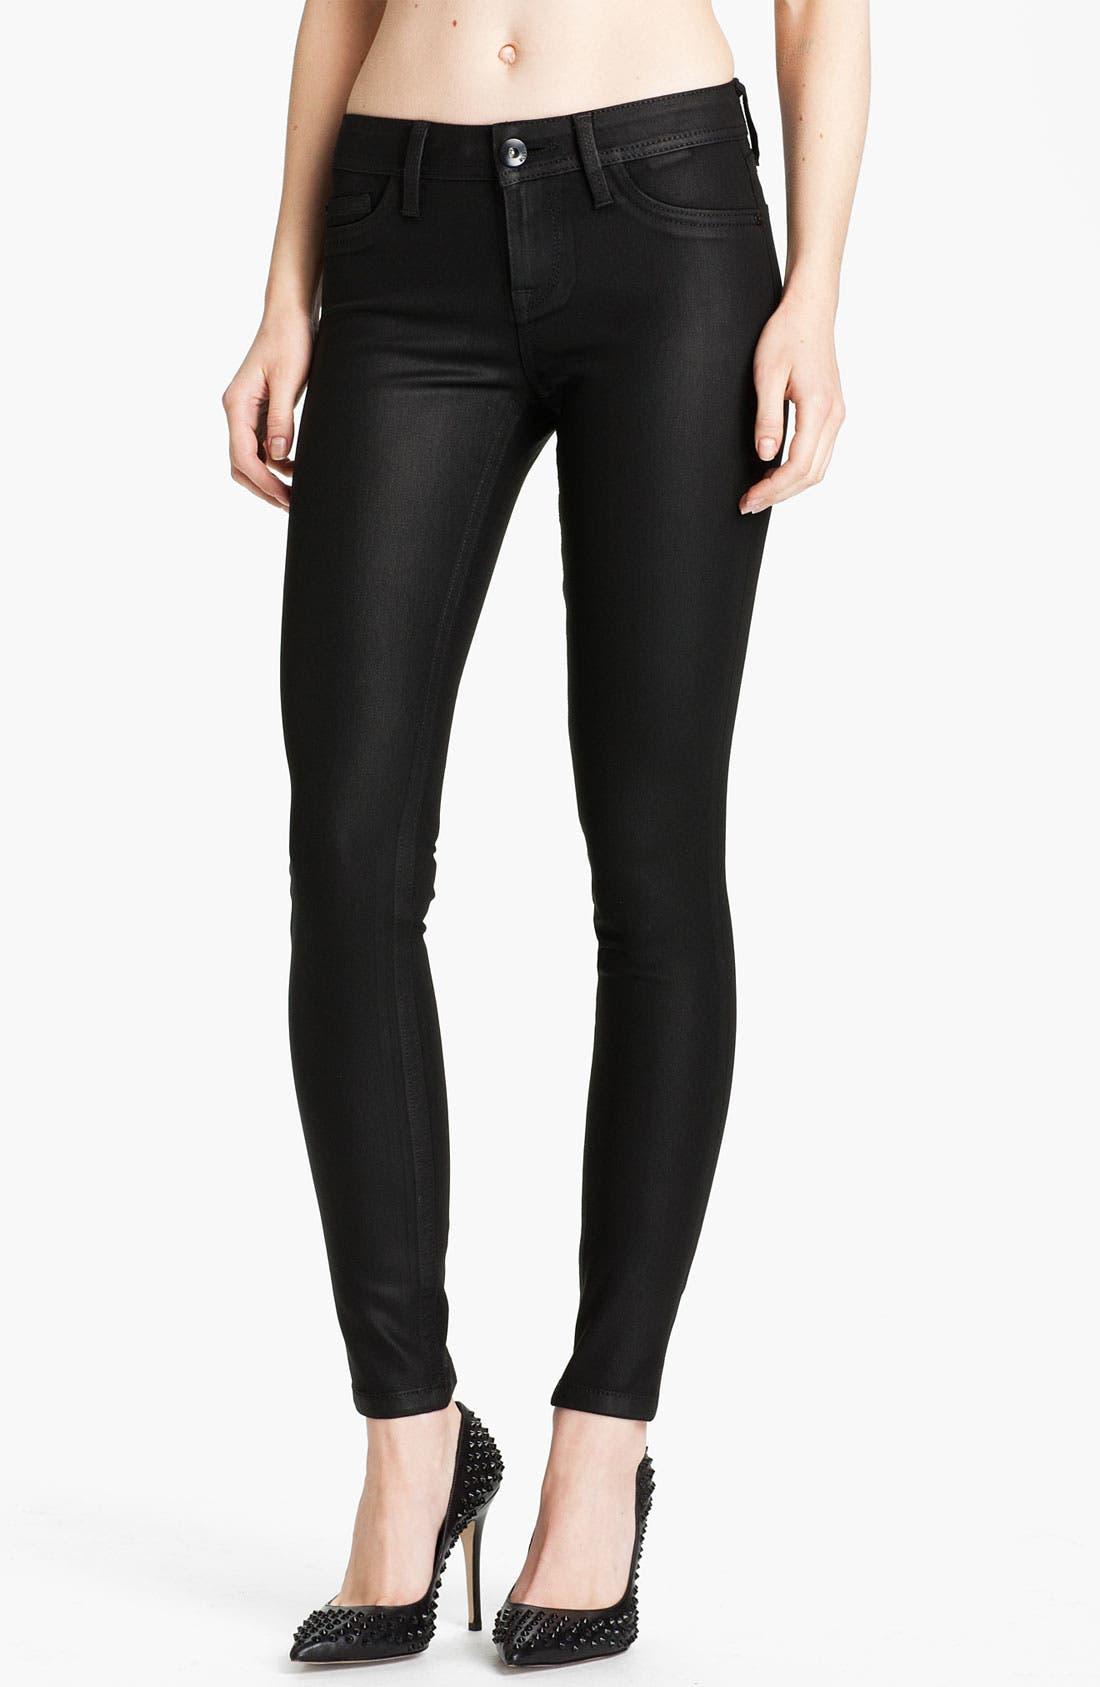 Alternate Image 1 Selected - DL1961 'Amanda' Coated Denim Skinny Jeans (Hematite)